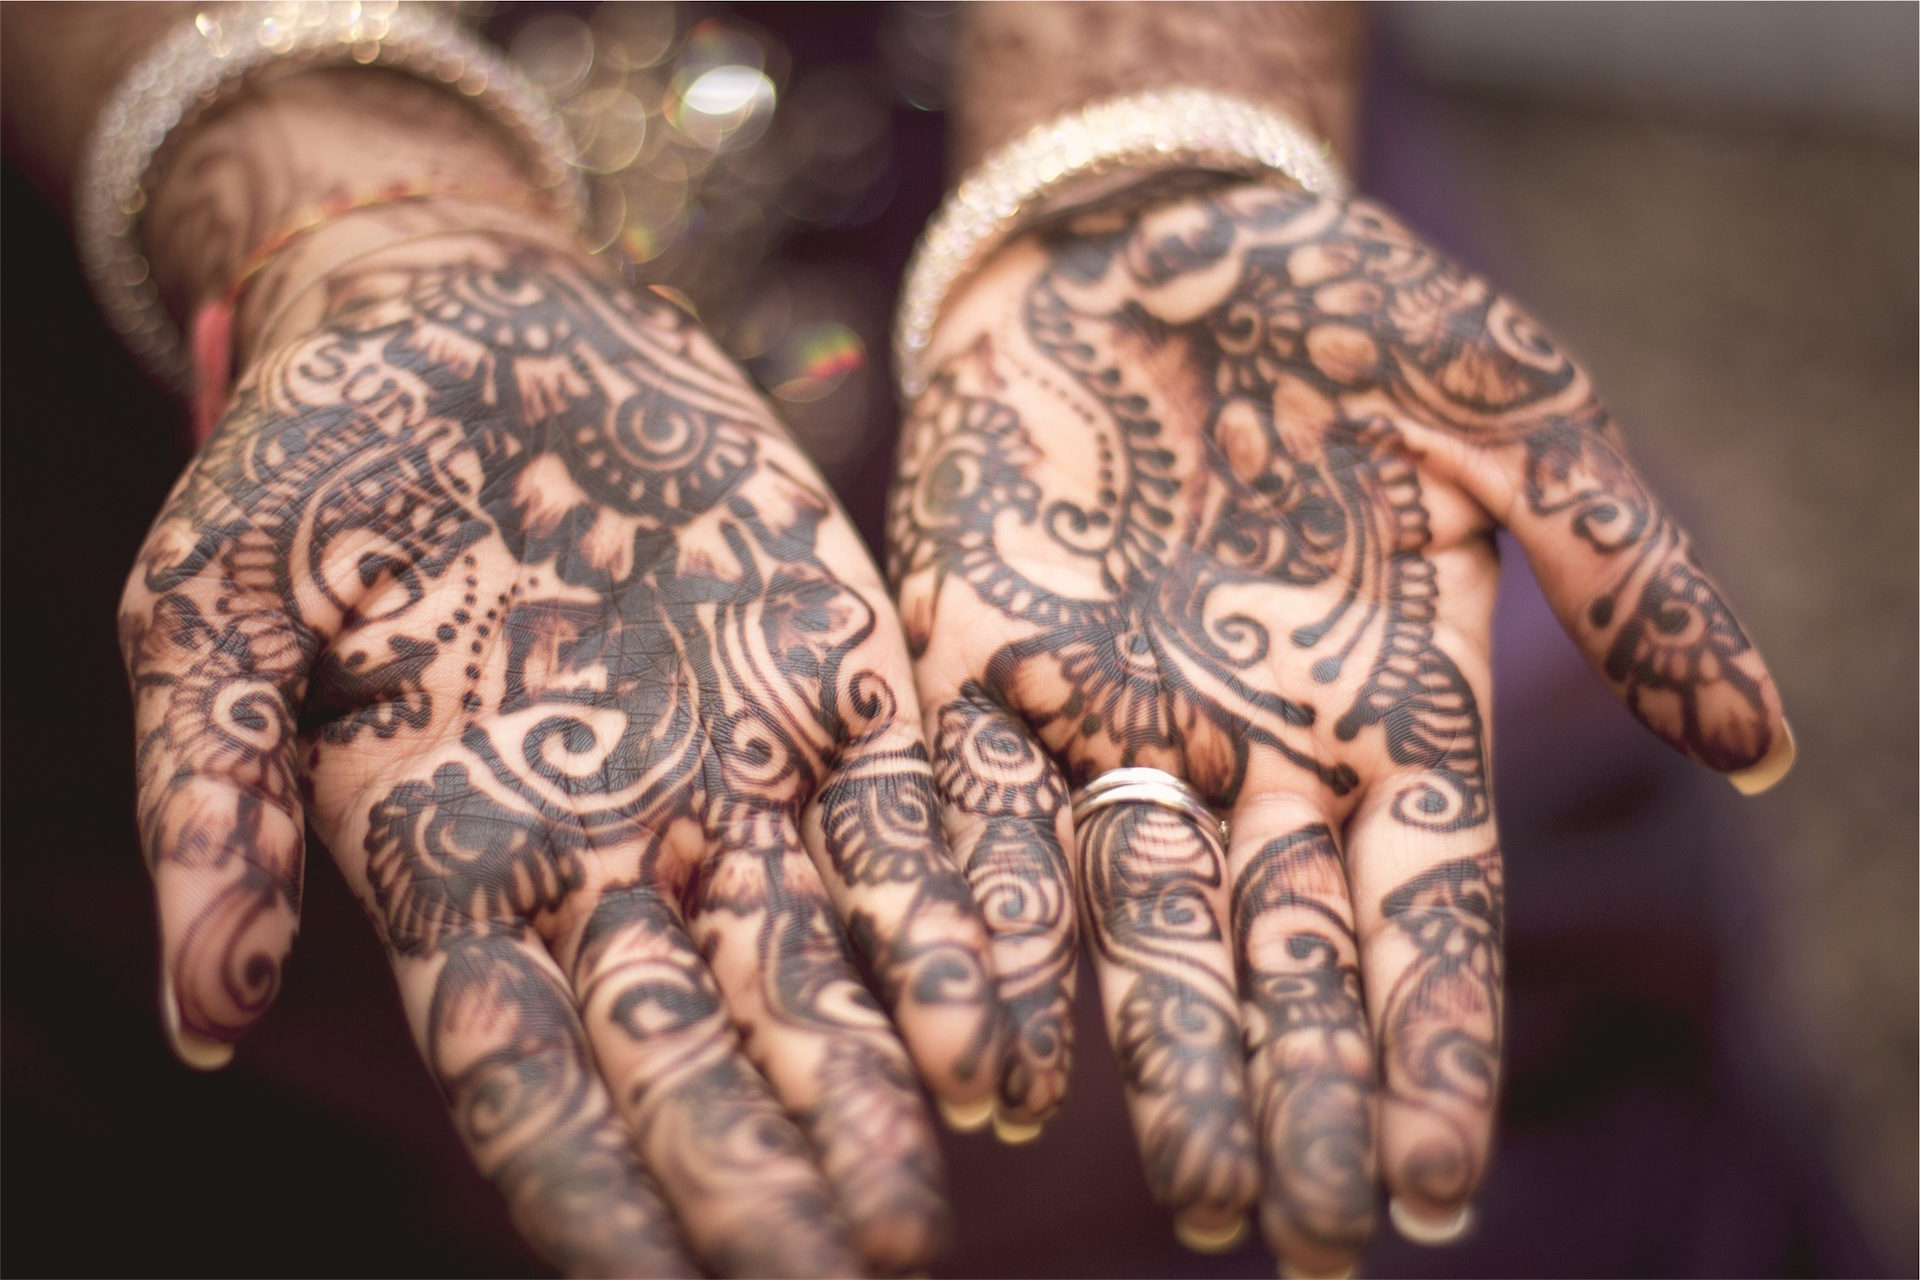 manos, tatuajes, pulseras, uñas, ritos - Fondos de Pantalla HD - professor-falken.com